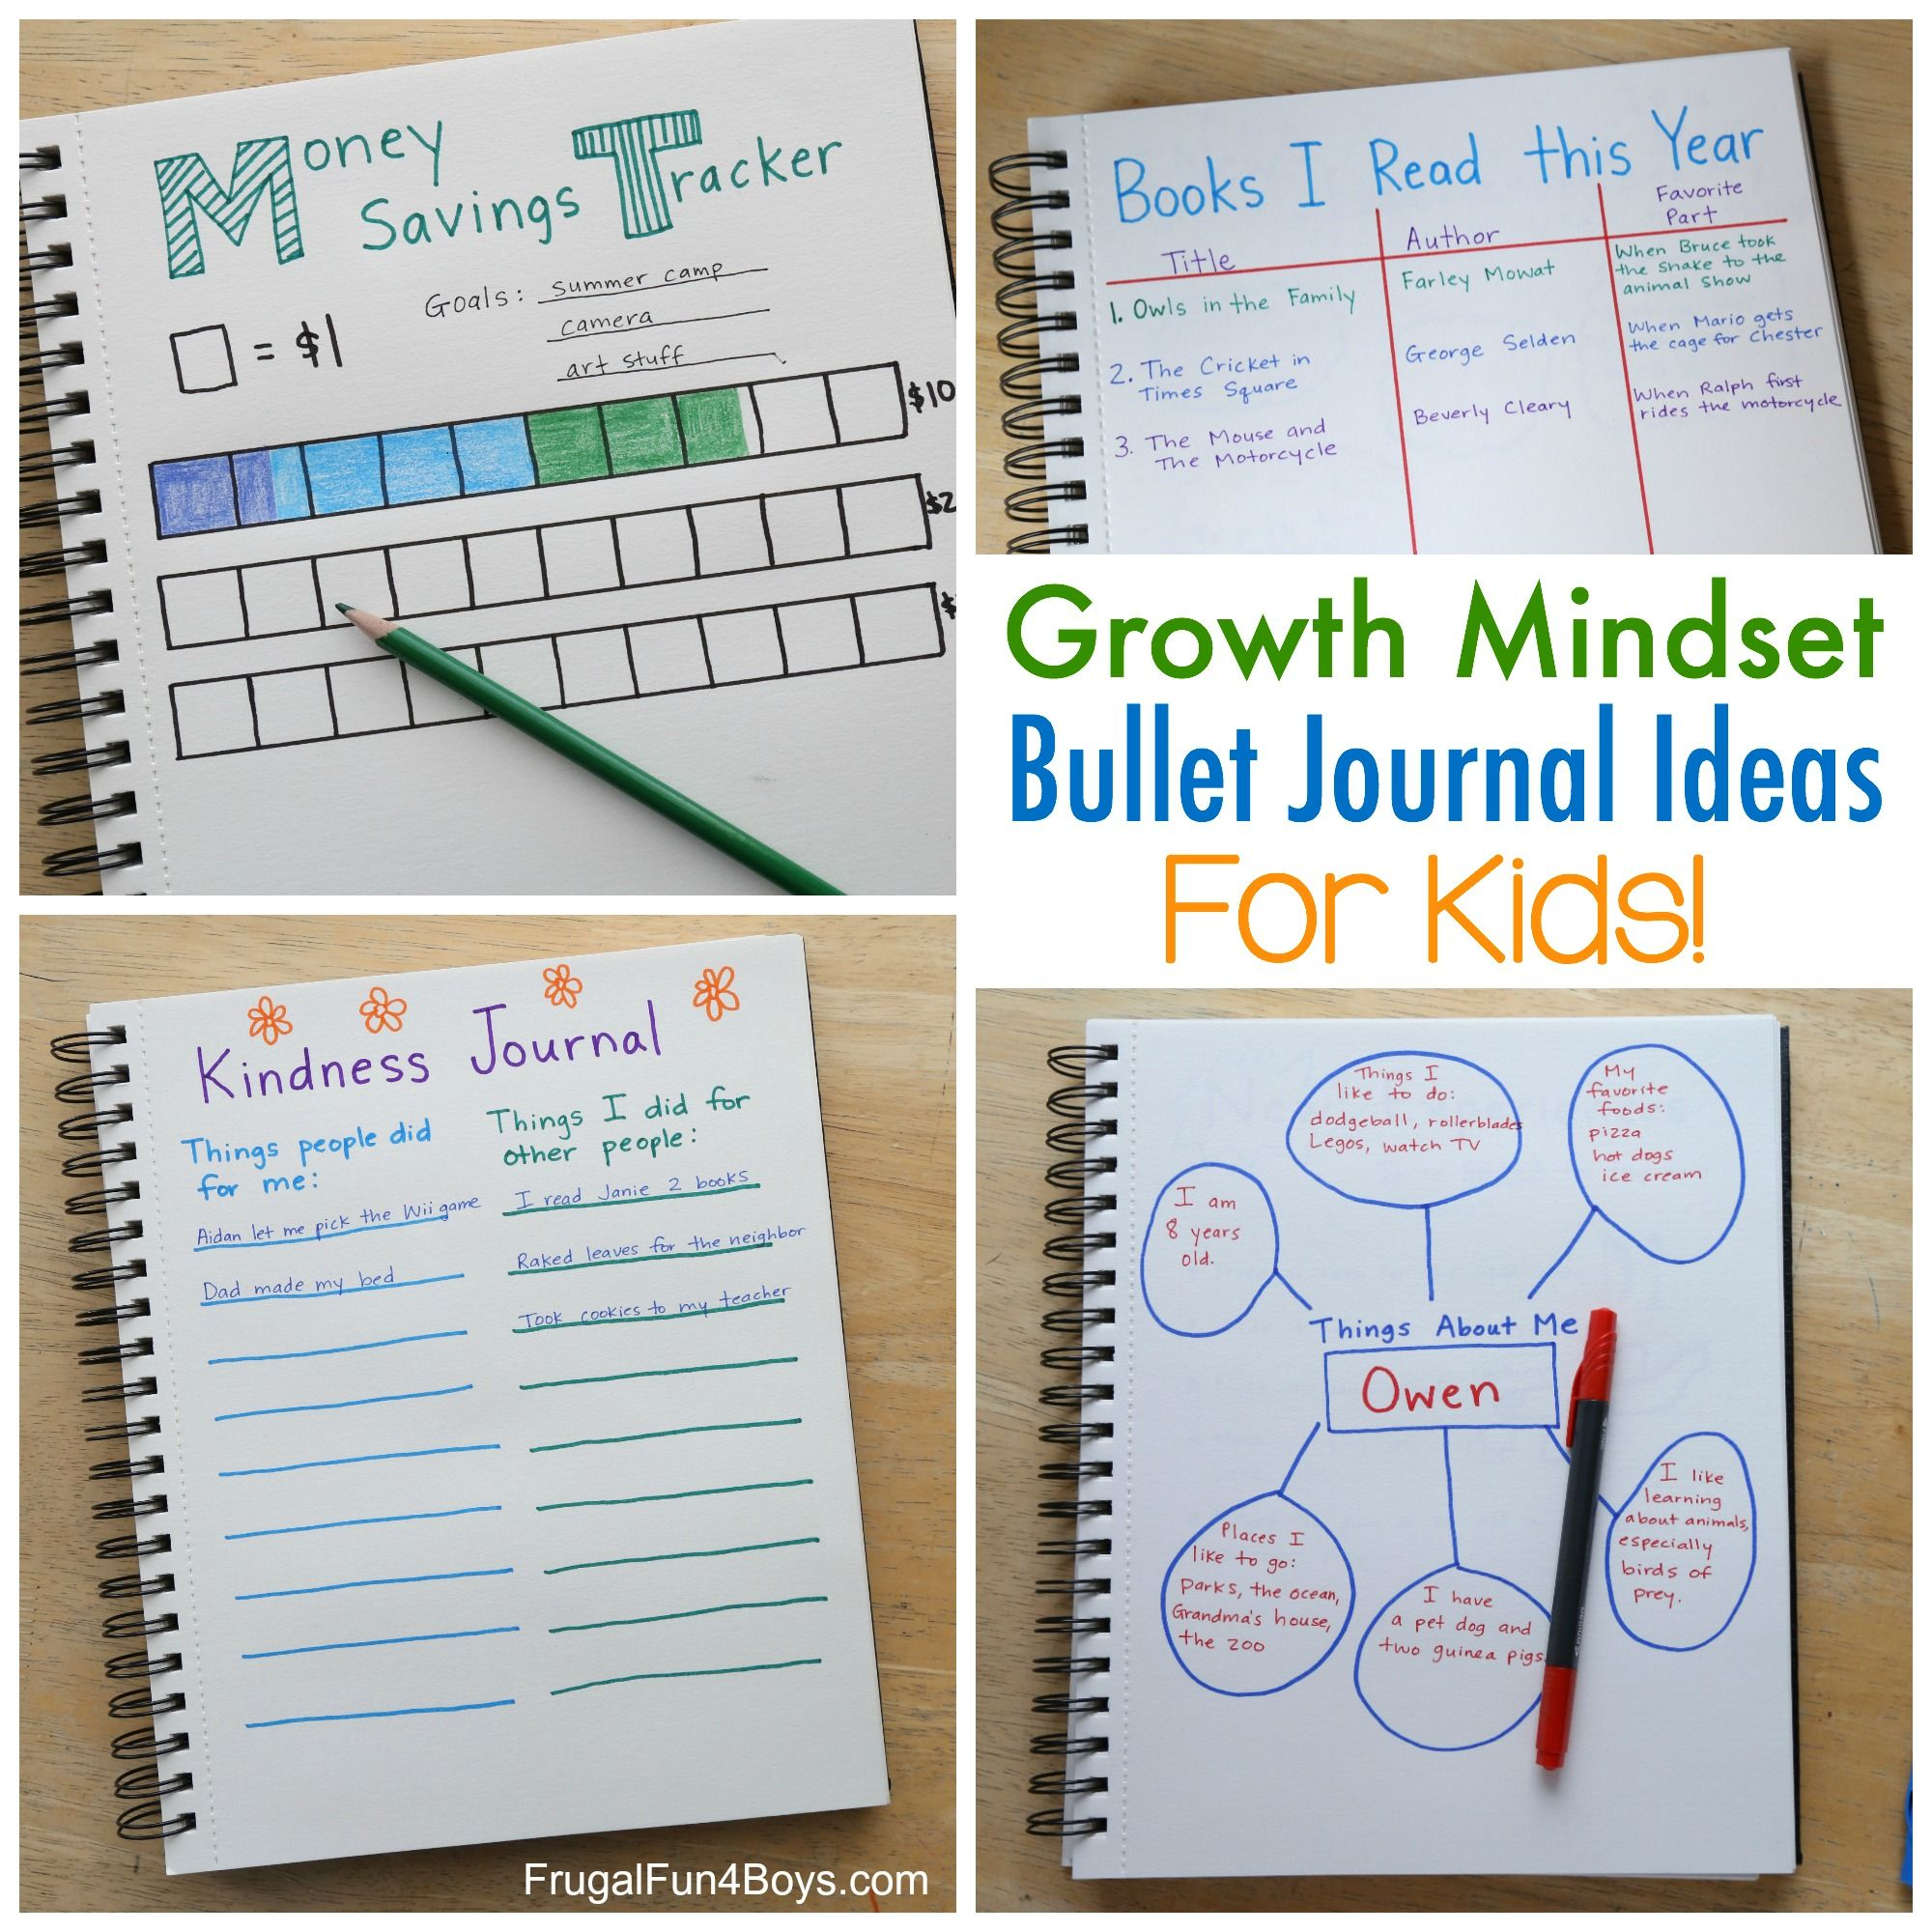 Growth Mindset Bullet Journal Ideas for Kids | growth mind set ...